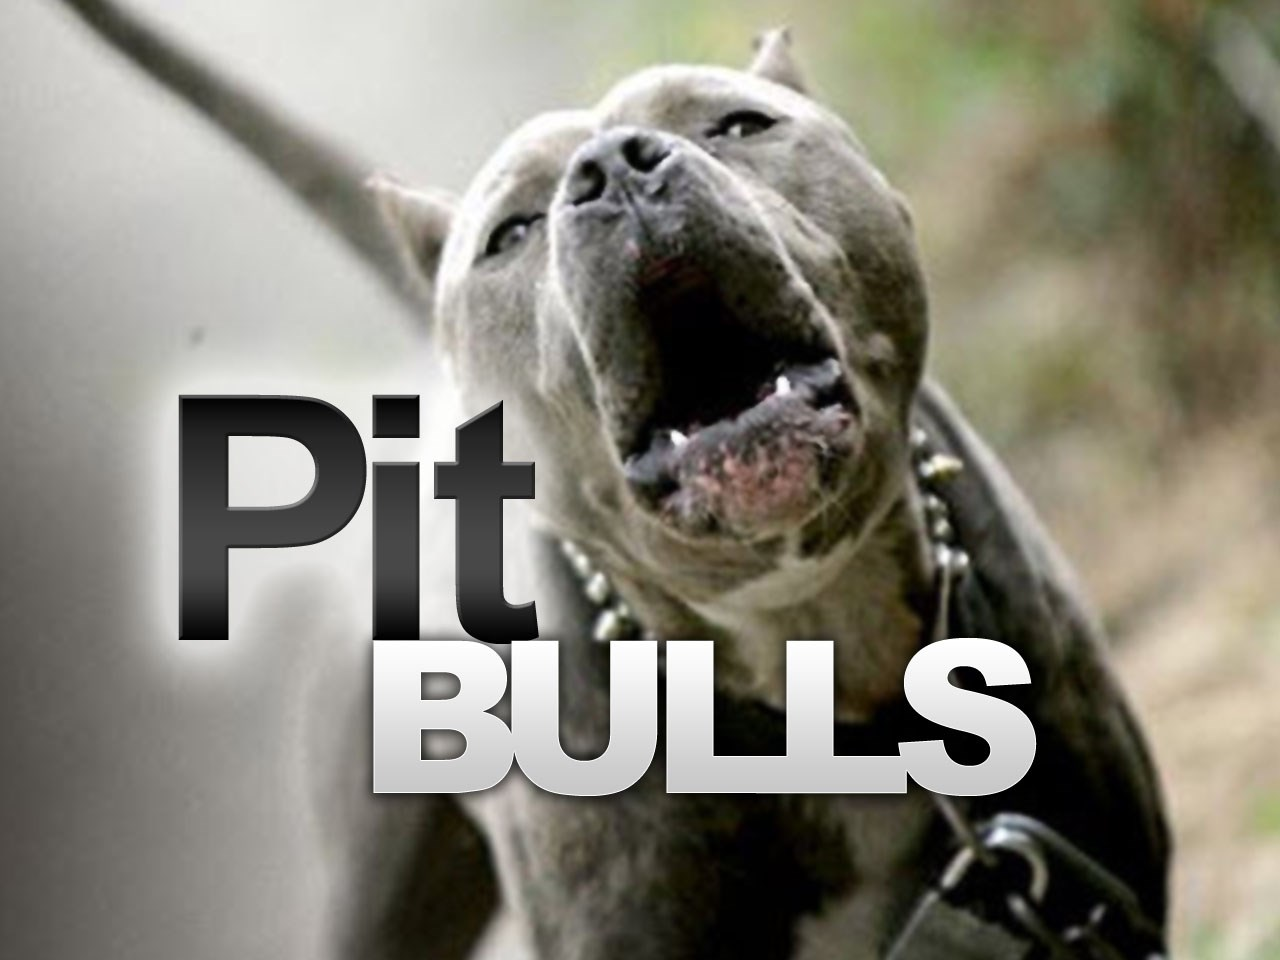 pit bulls_1471129736454.jpg